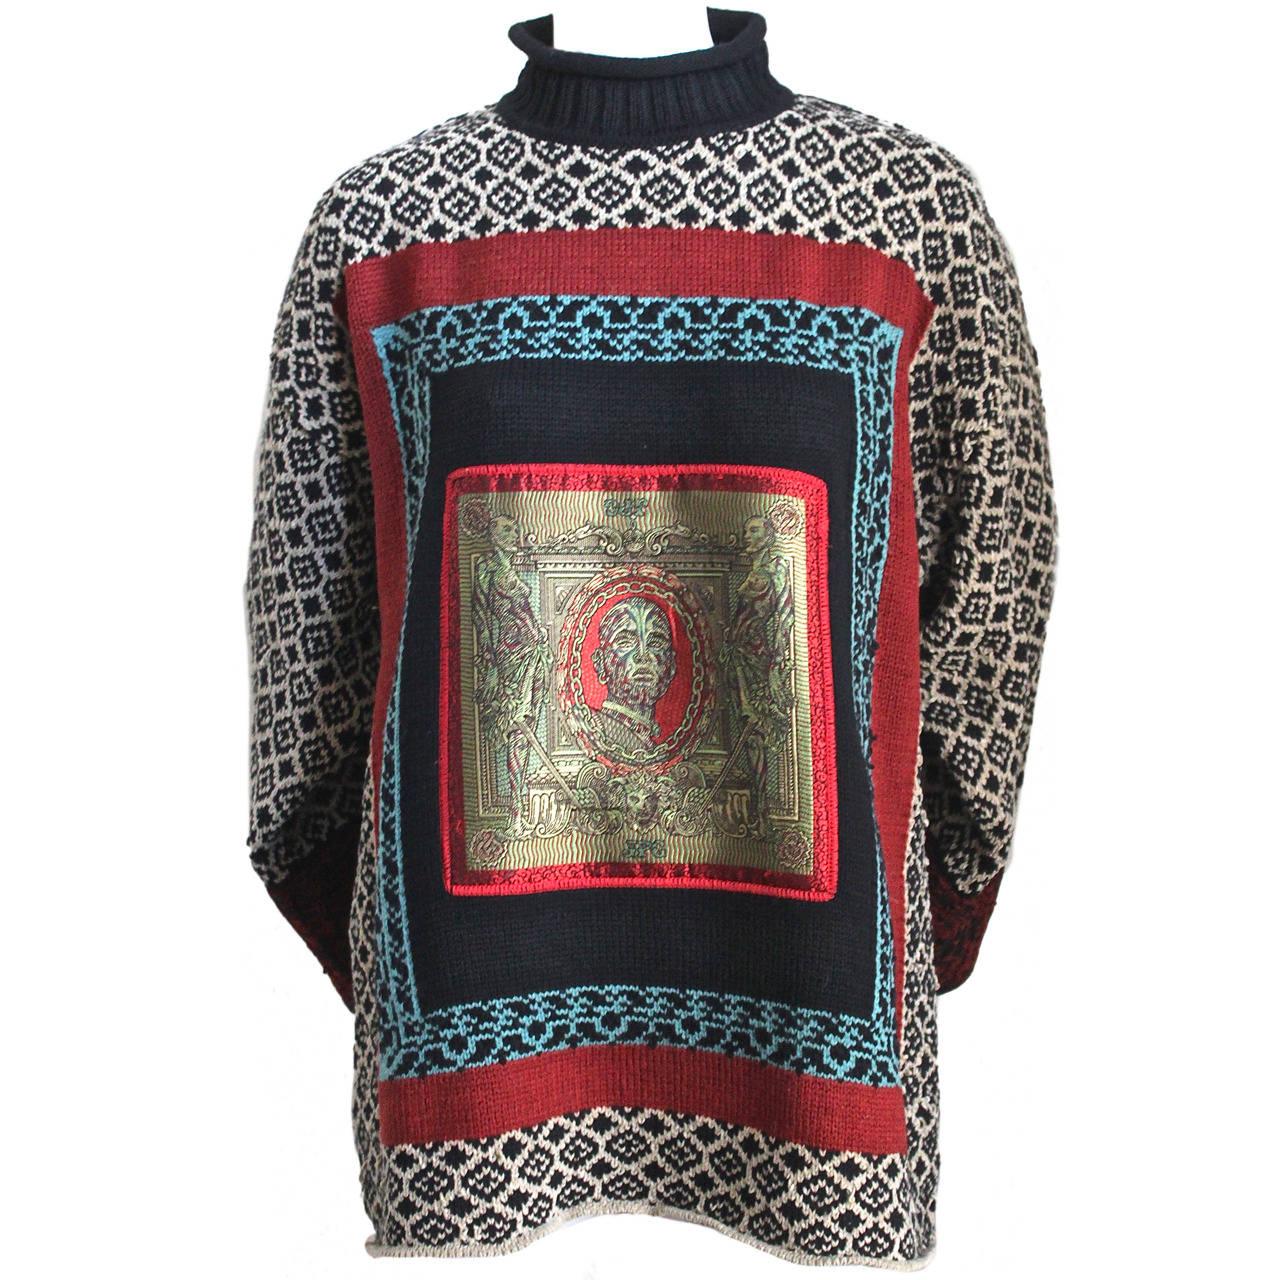 1994 JEAN PAUL GAULTIER 'le grande voyage' runway sweater. 1